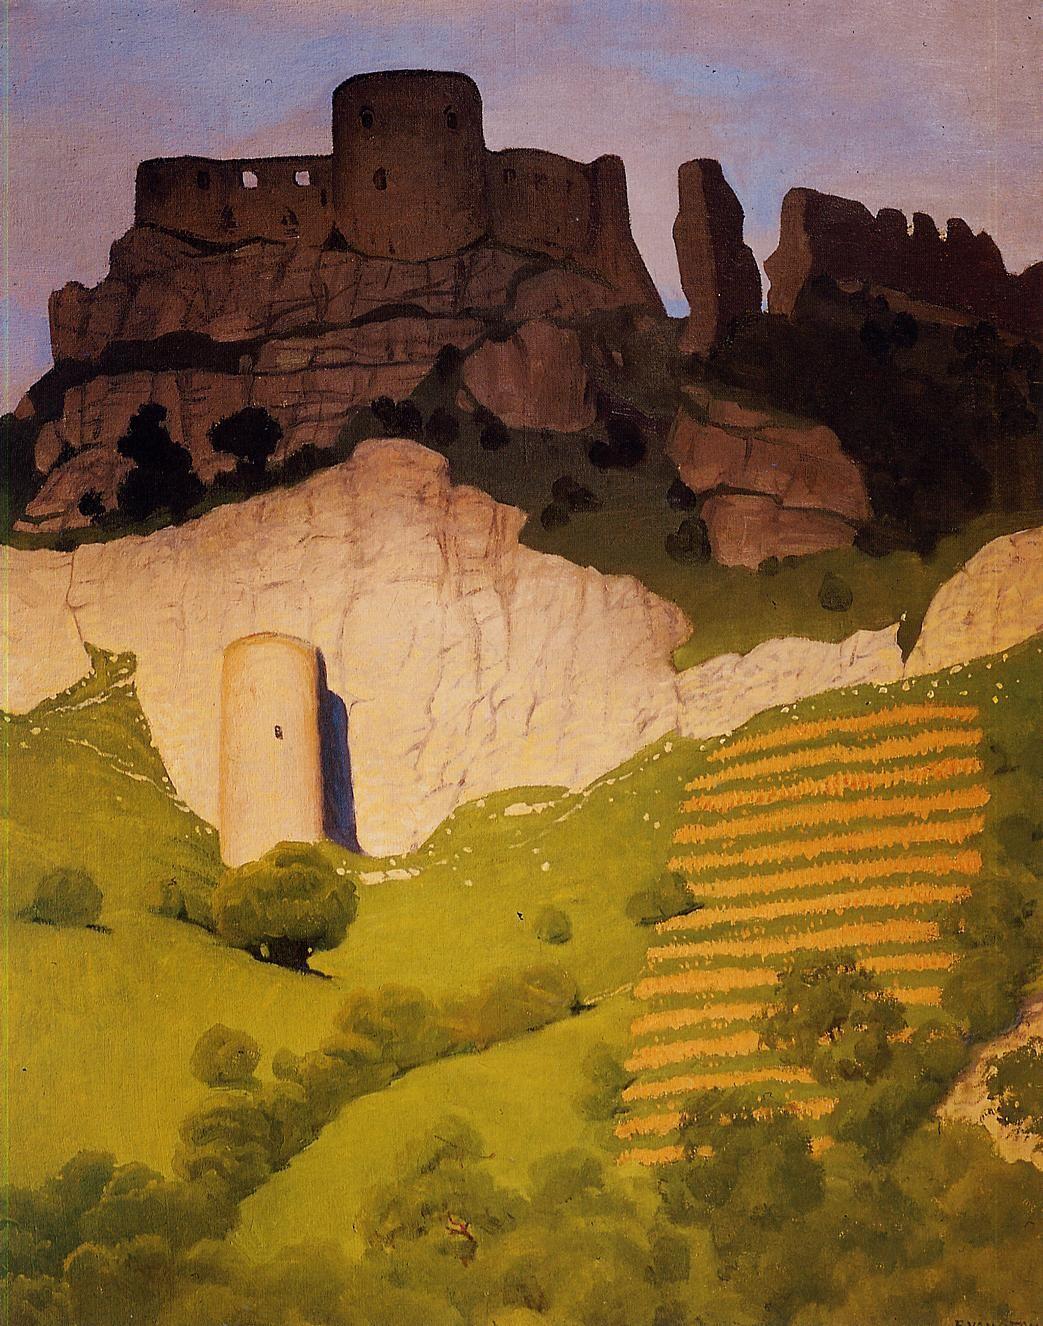 peira:    Felix Vallotton:  Chateau Gaillard at Andelys (1924) via WikiPaintings